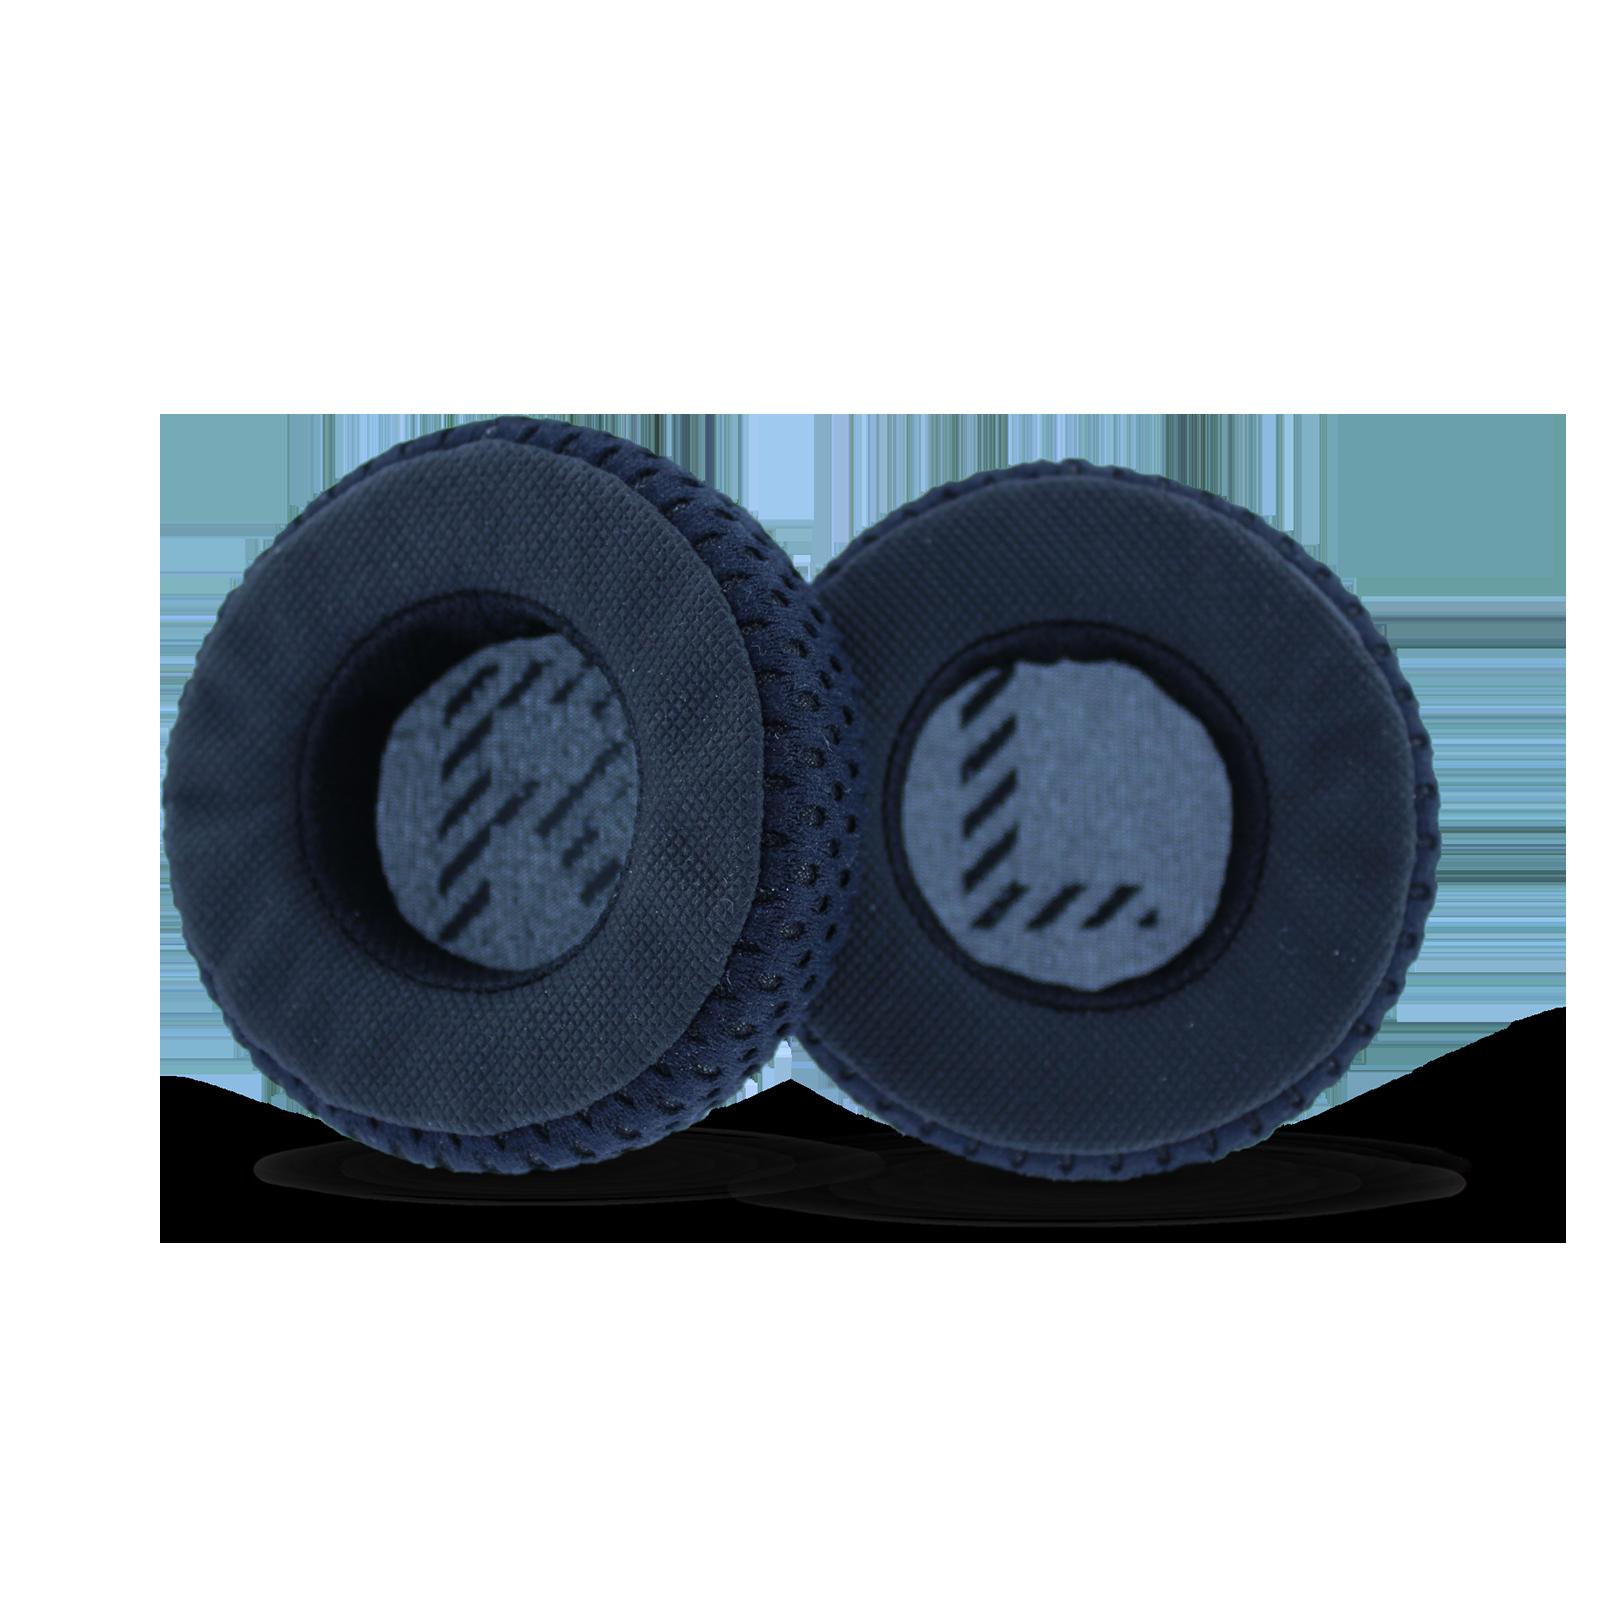 Ear pad set for UA Sport - Black - Ear pads (L+R) - Hero